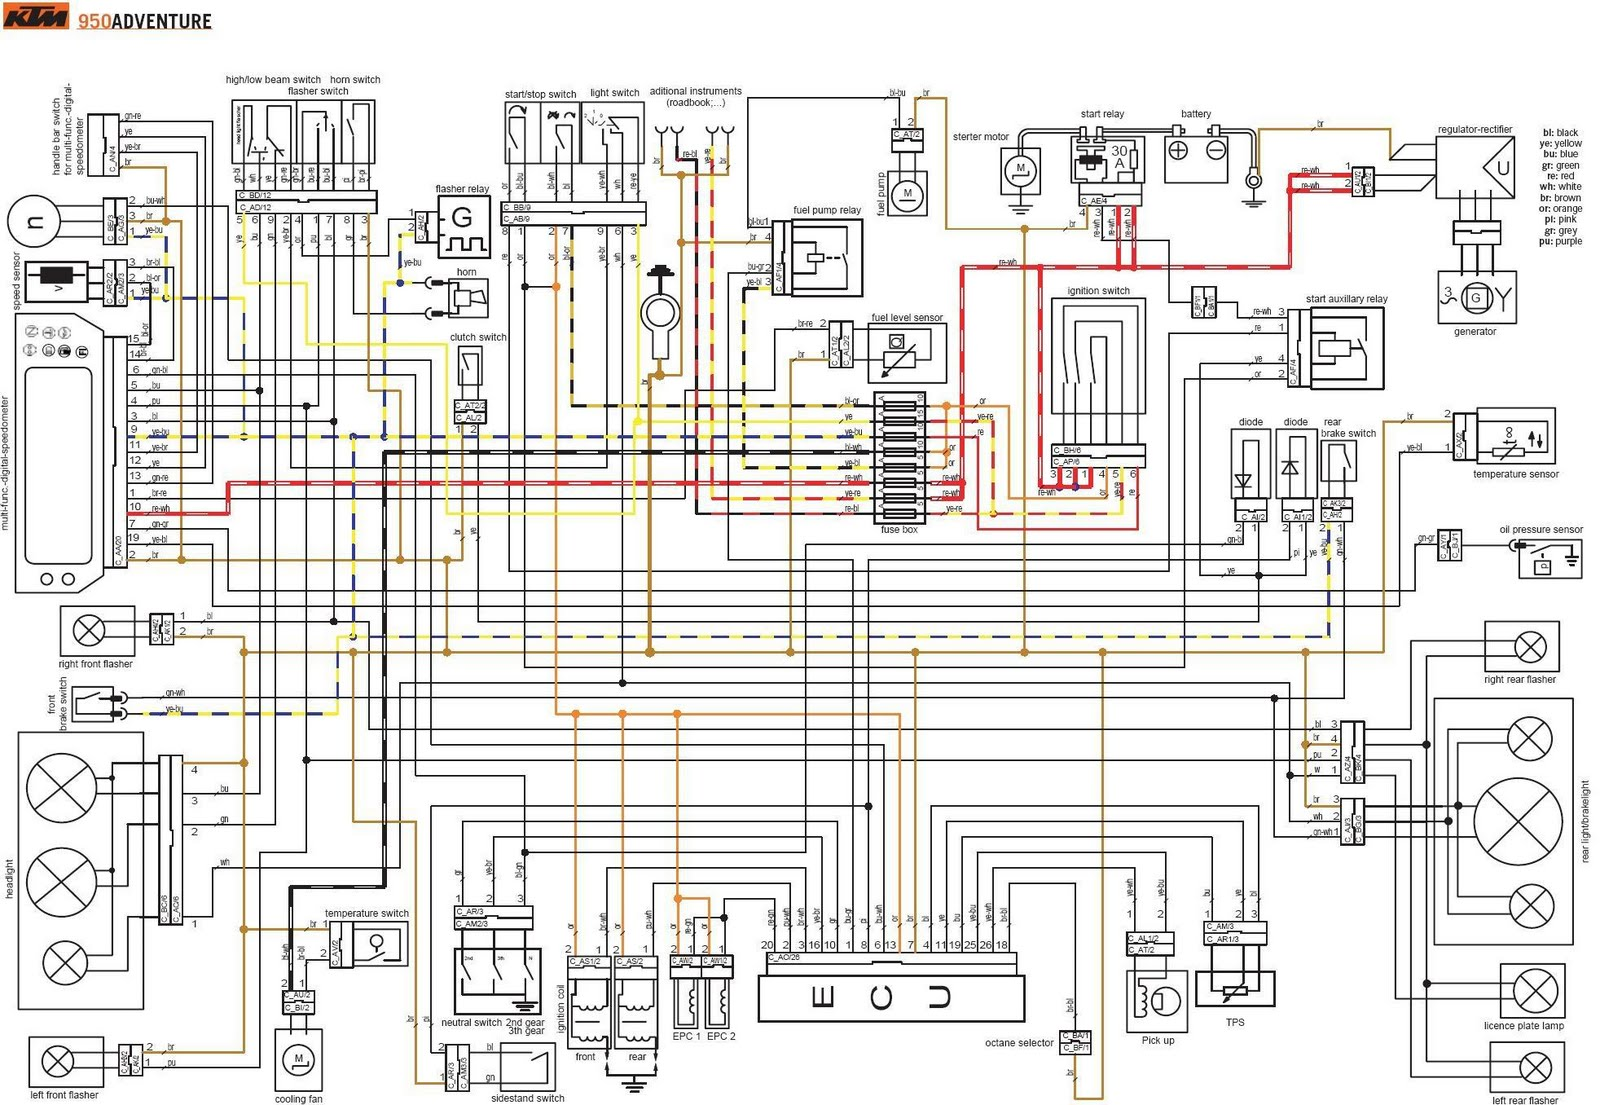 ktm duke 125 wiring diagram power relay piaggio zip 50 2t 32